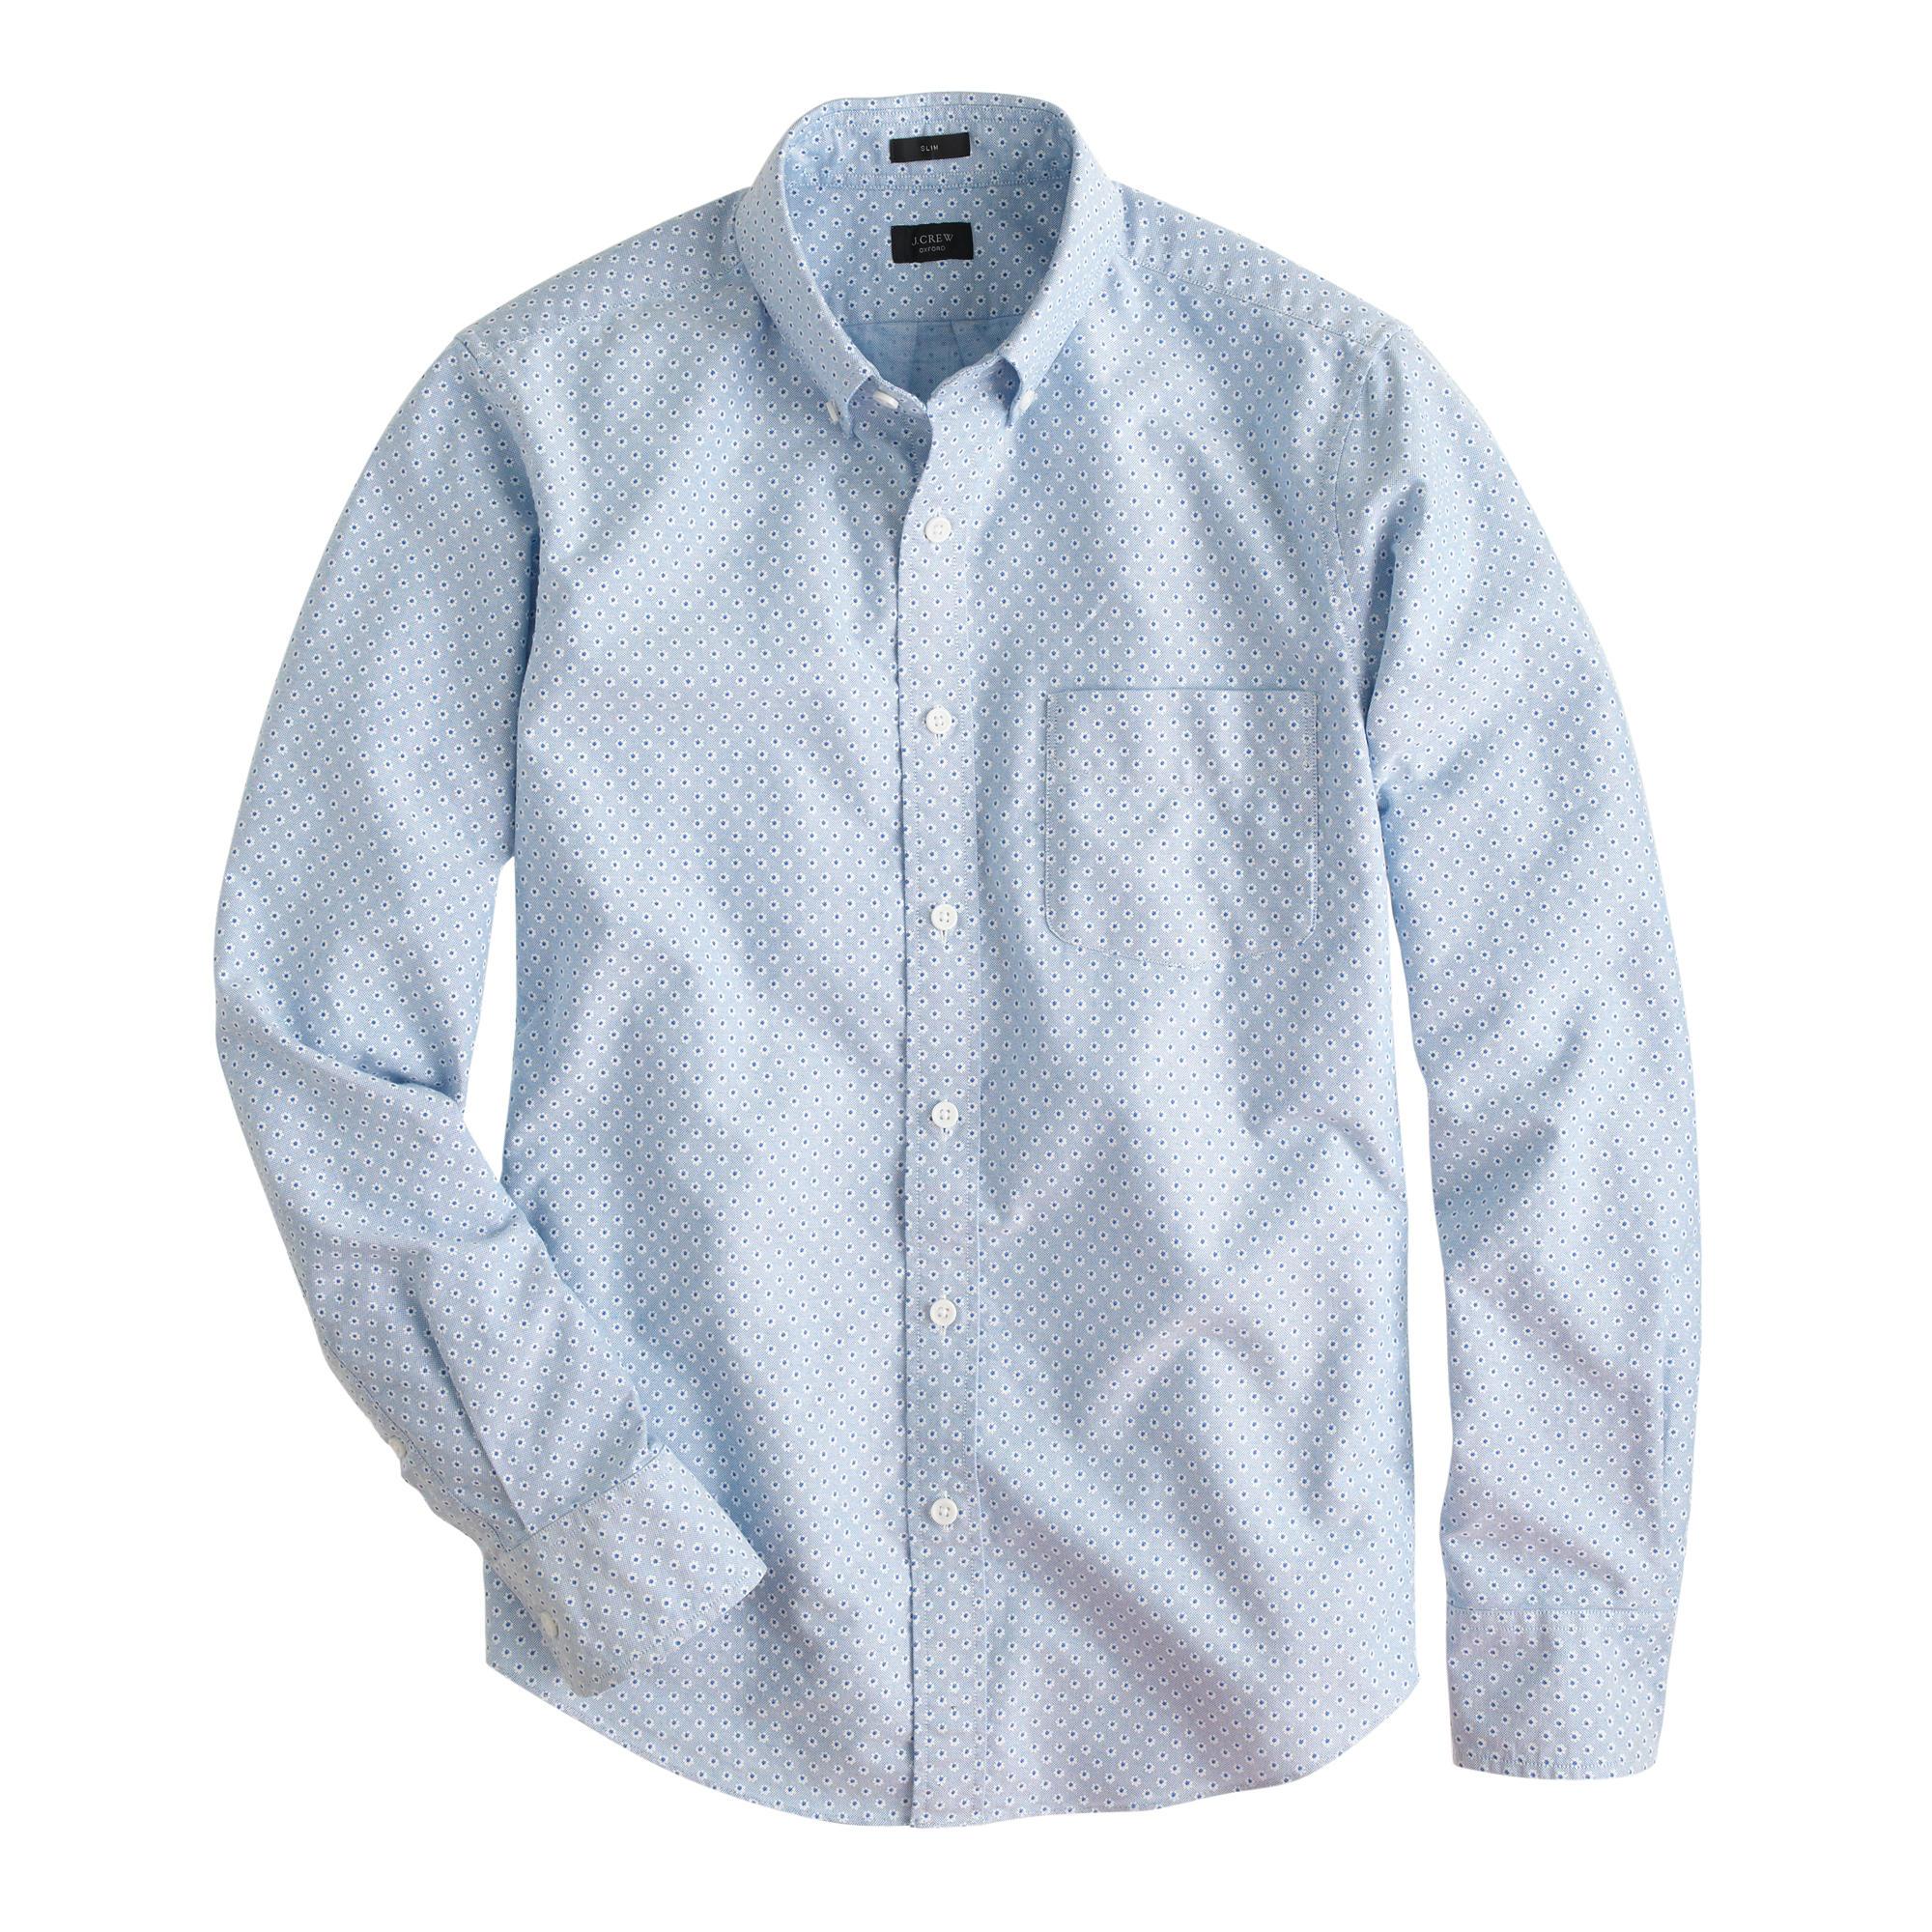 Slim Vintage Oxford Shirt In Daisy Print For Men Lyst